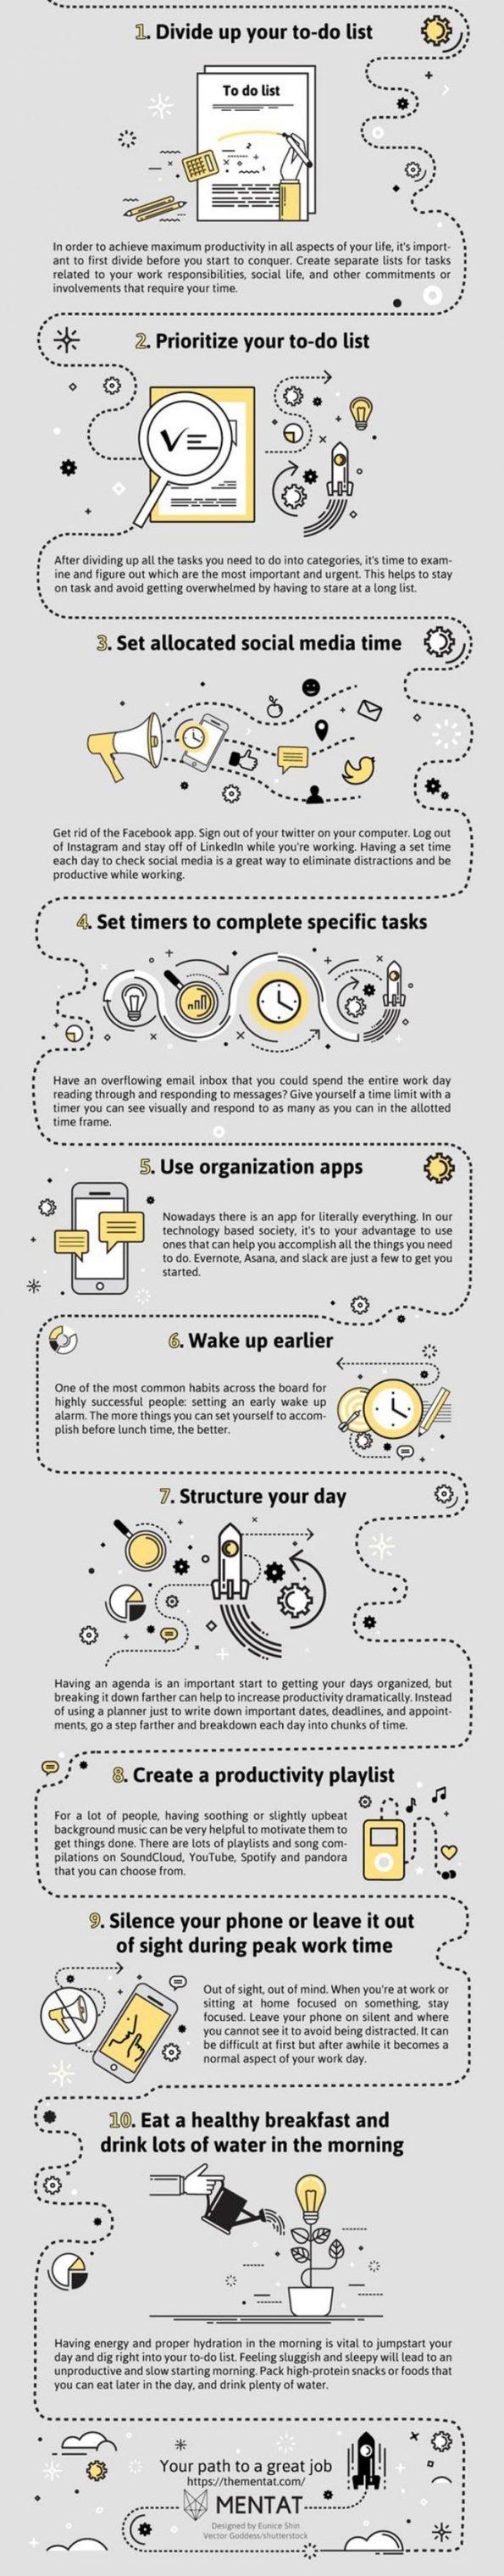 mentat-productivity-infographic-20-700x3577